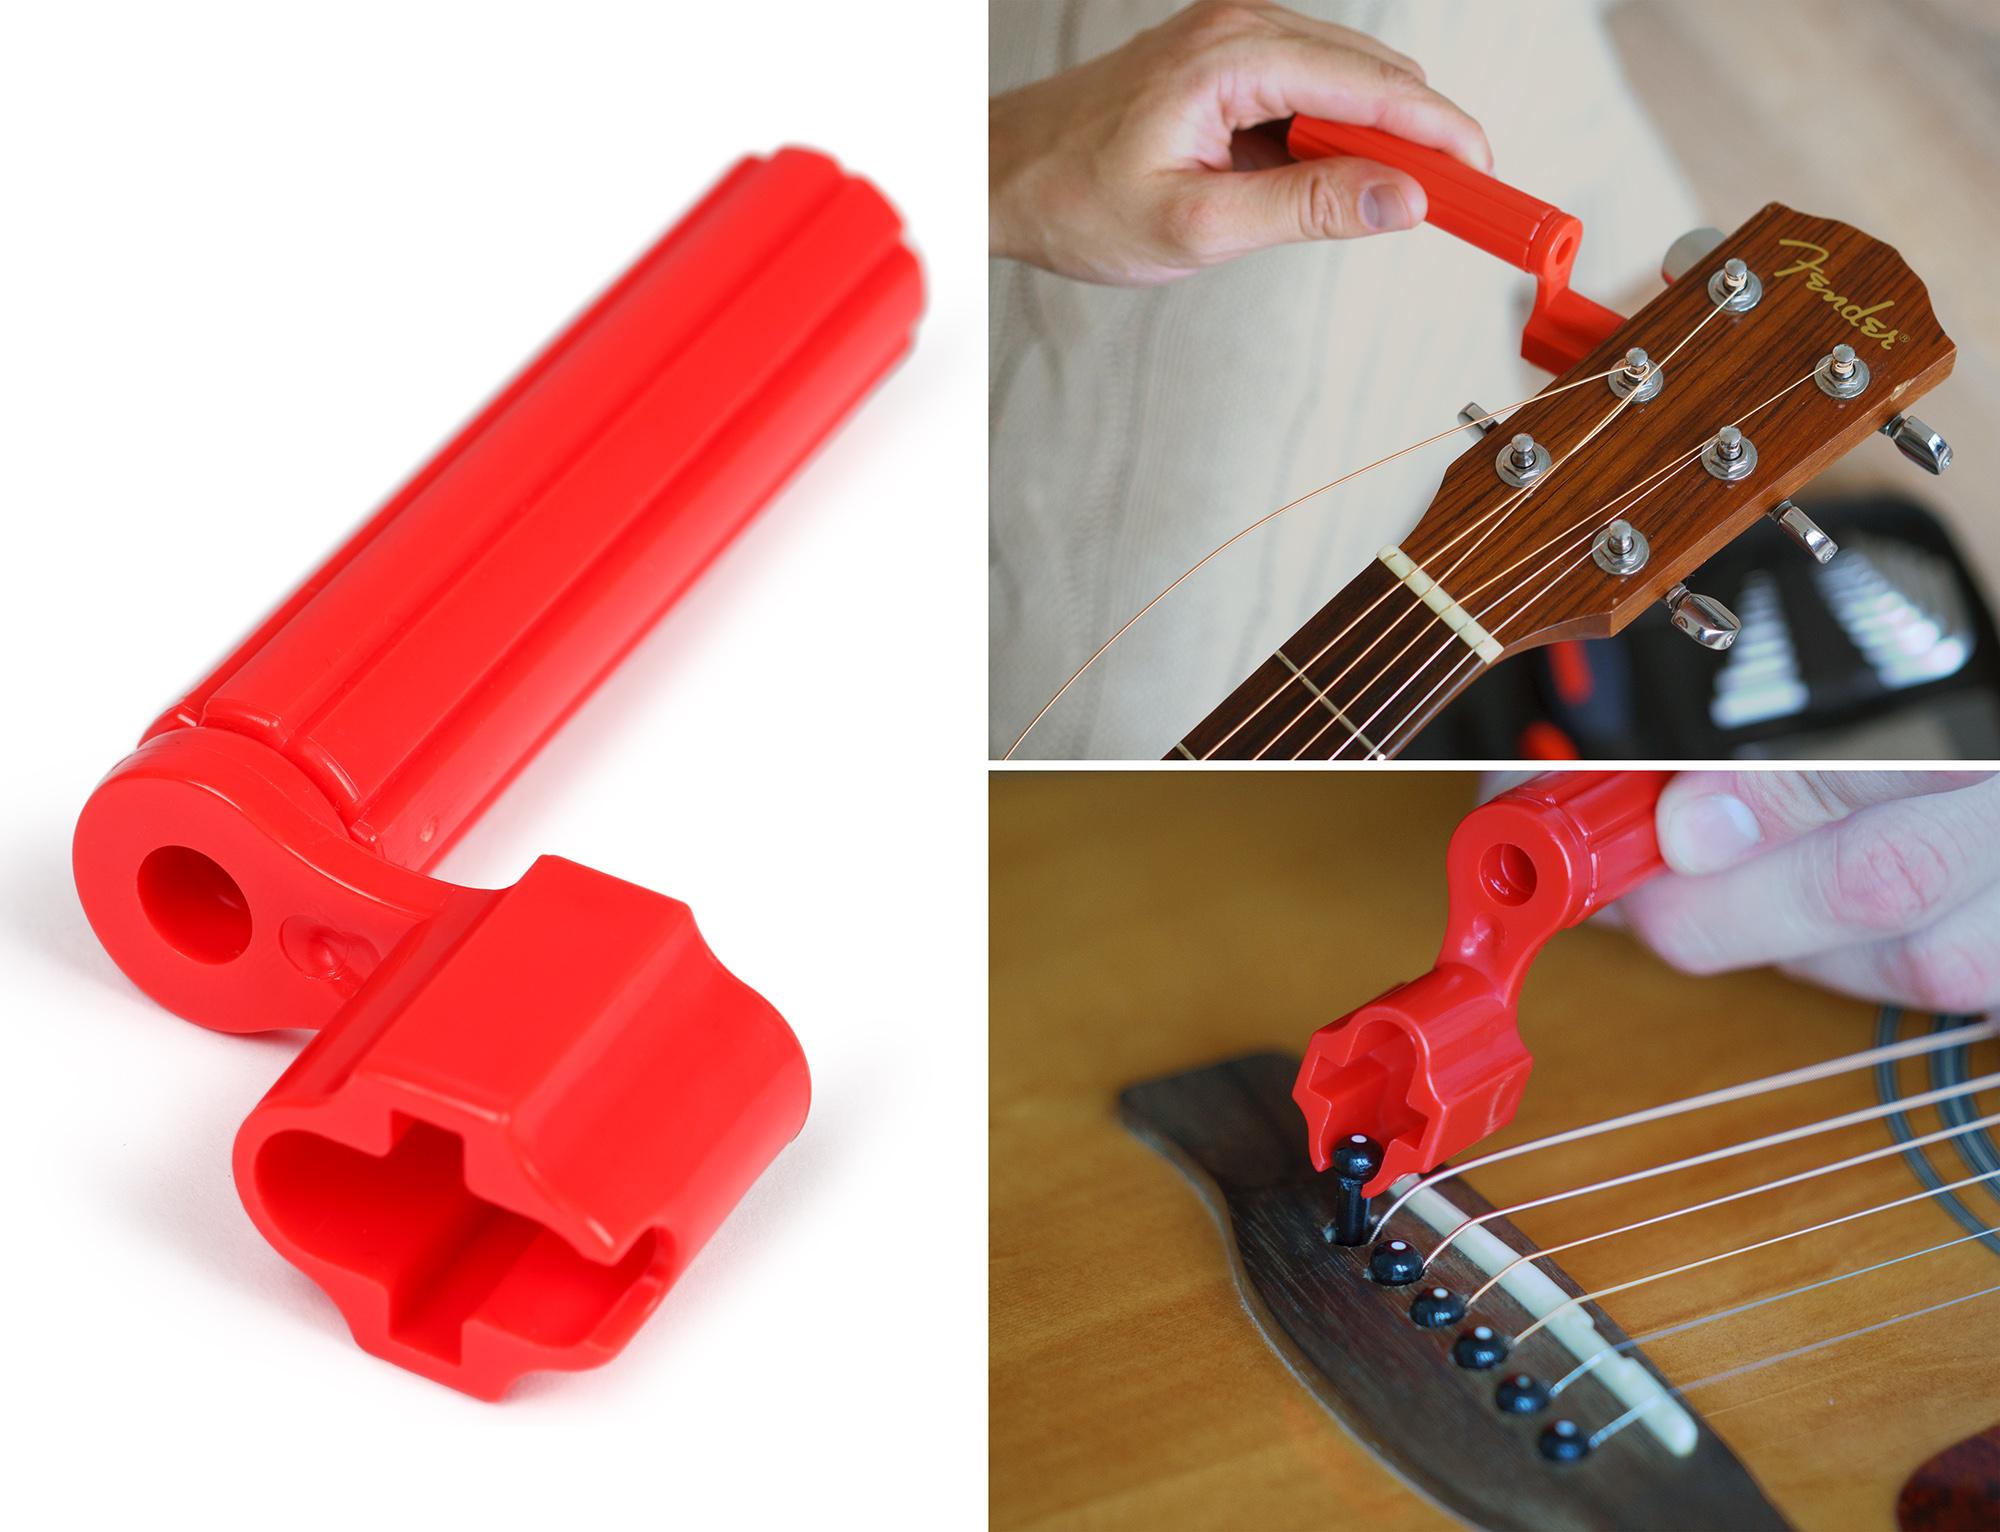 kenley guitar care cleaning repair tool kit luthier setup maintenance tools set ebay. Black Bedroom Furniture Sets. Home Design Ideas